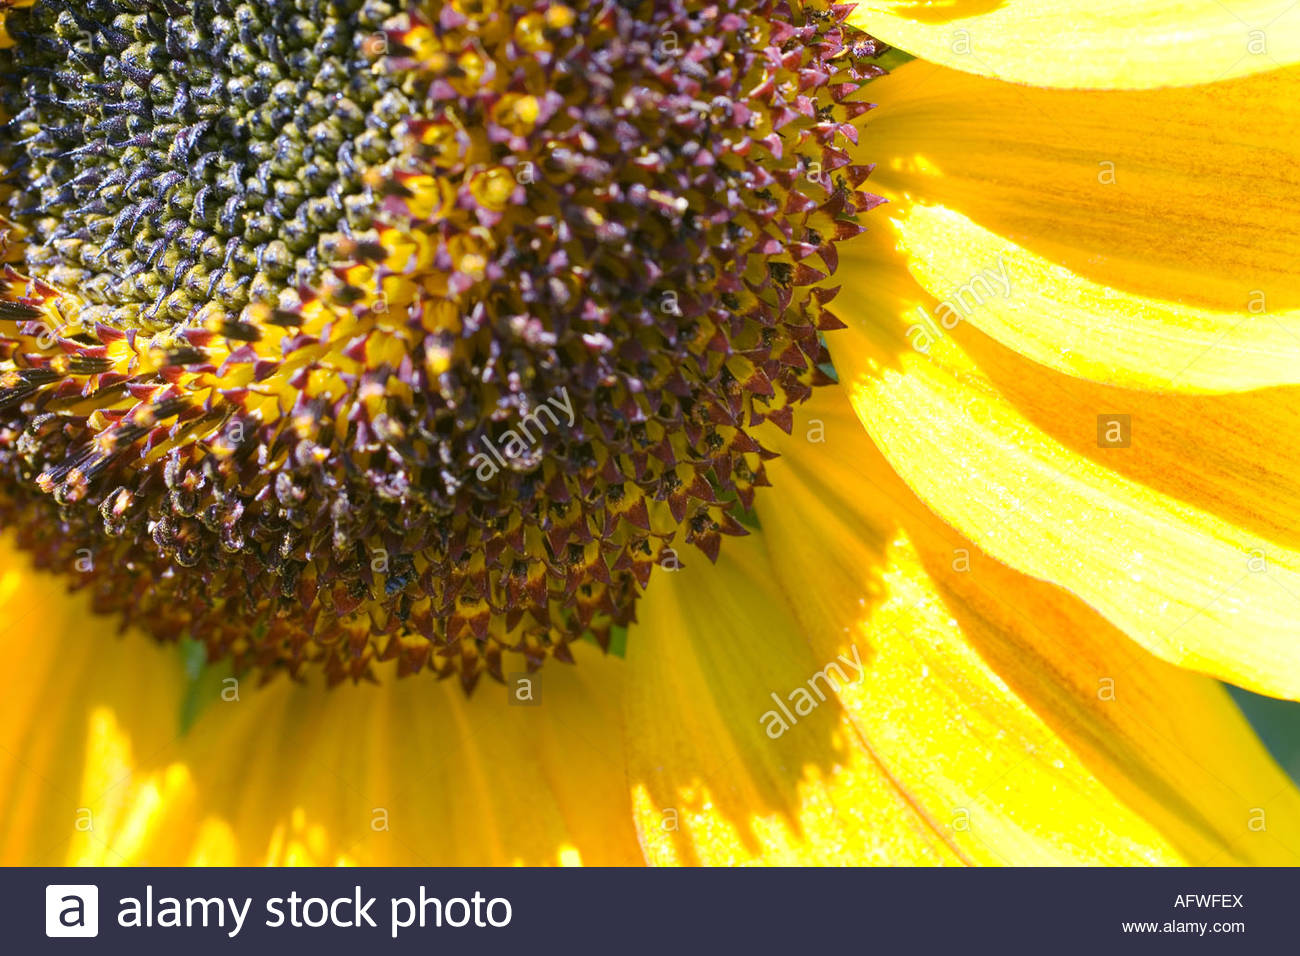 slunecnice / sunflower / helianthus annuus - Stock Image